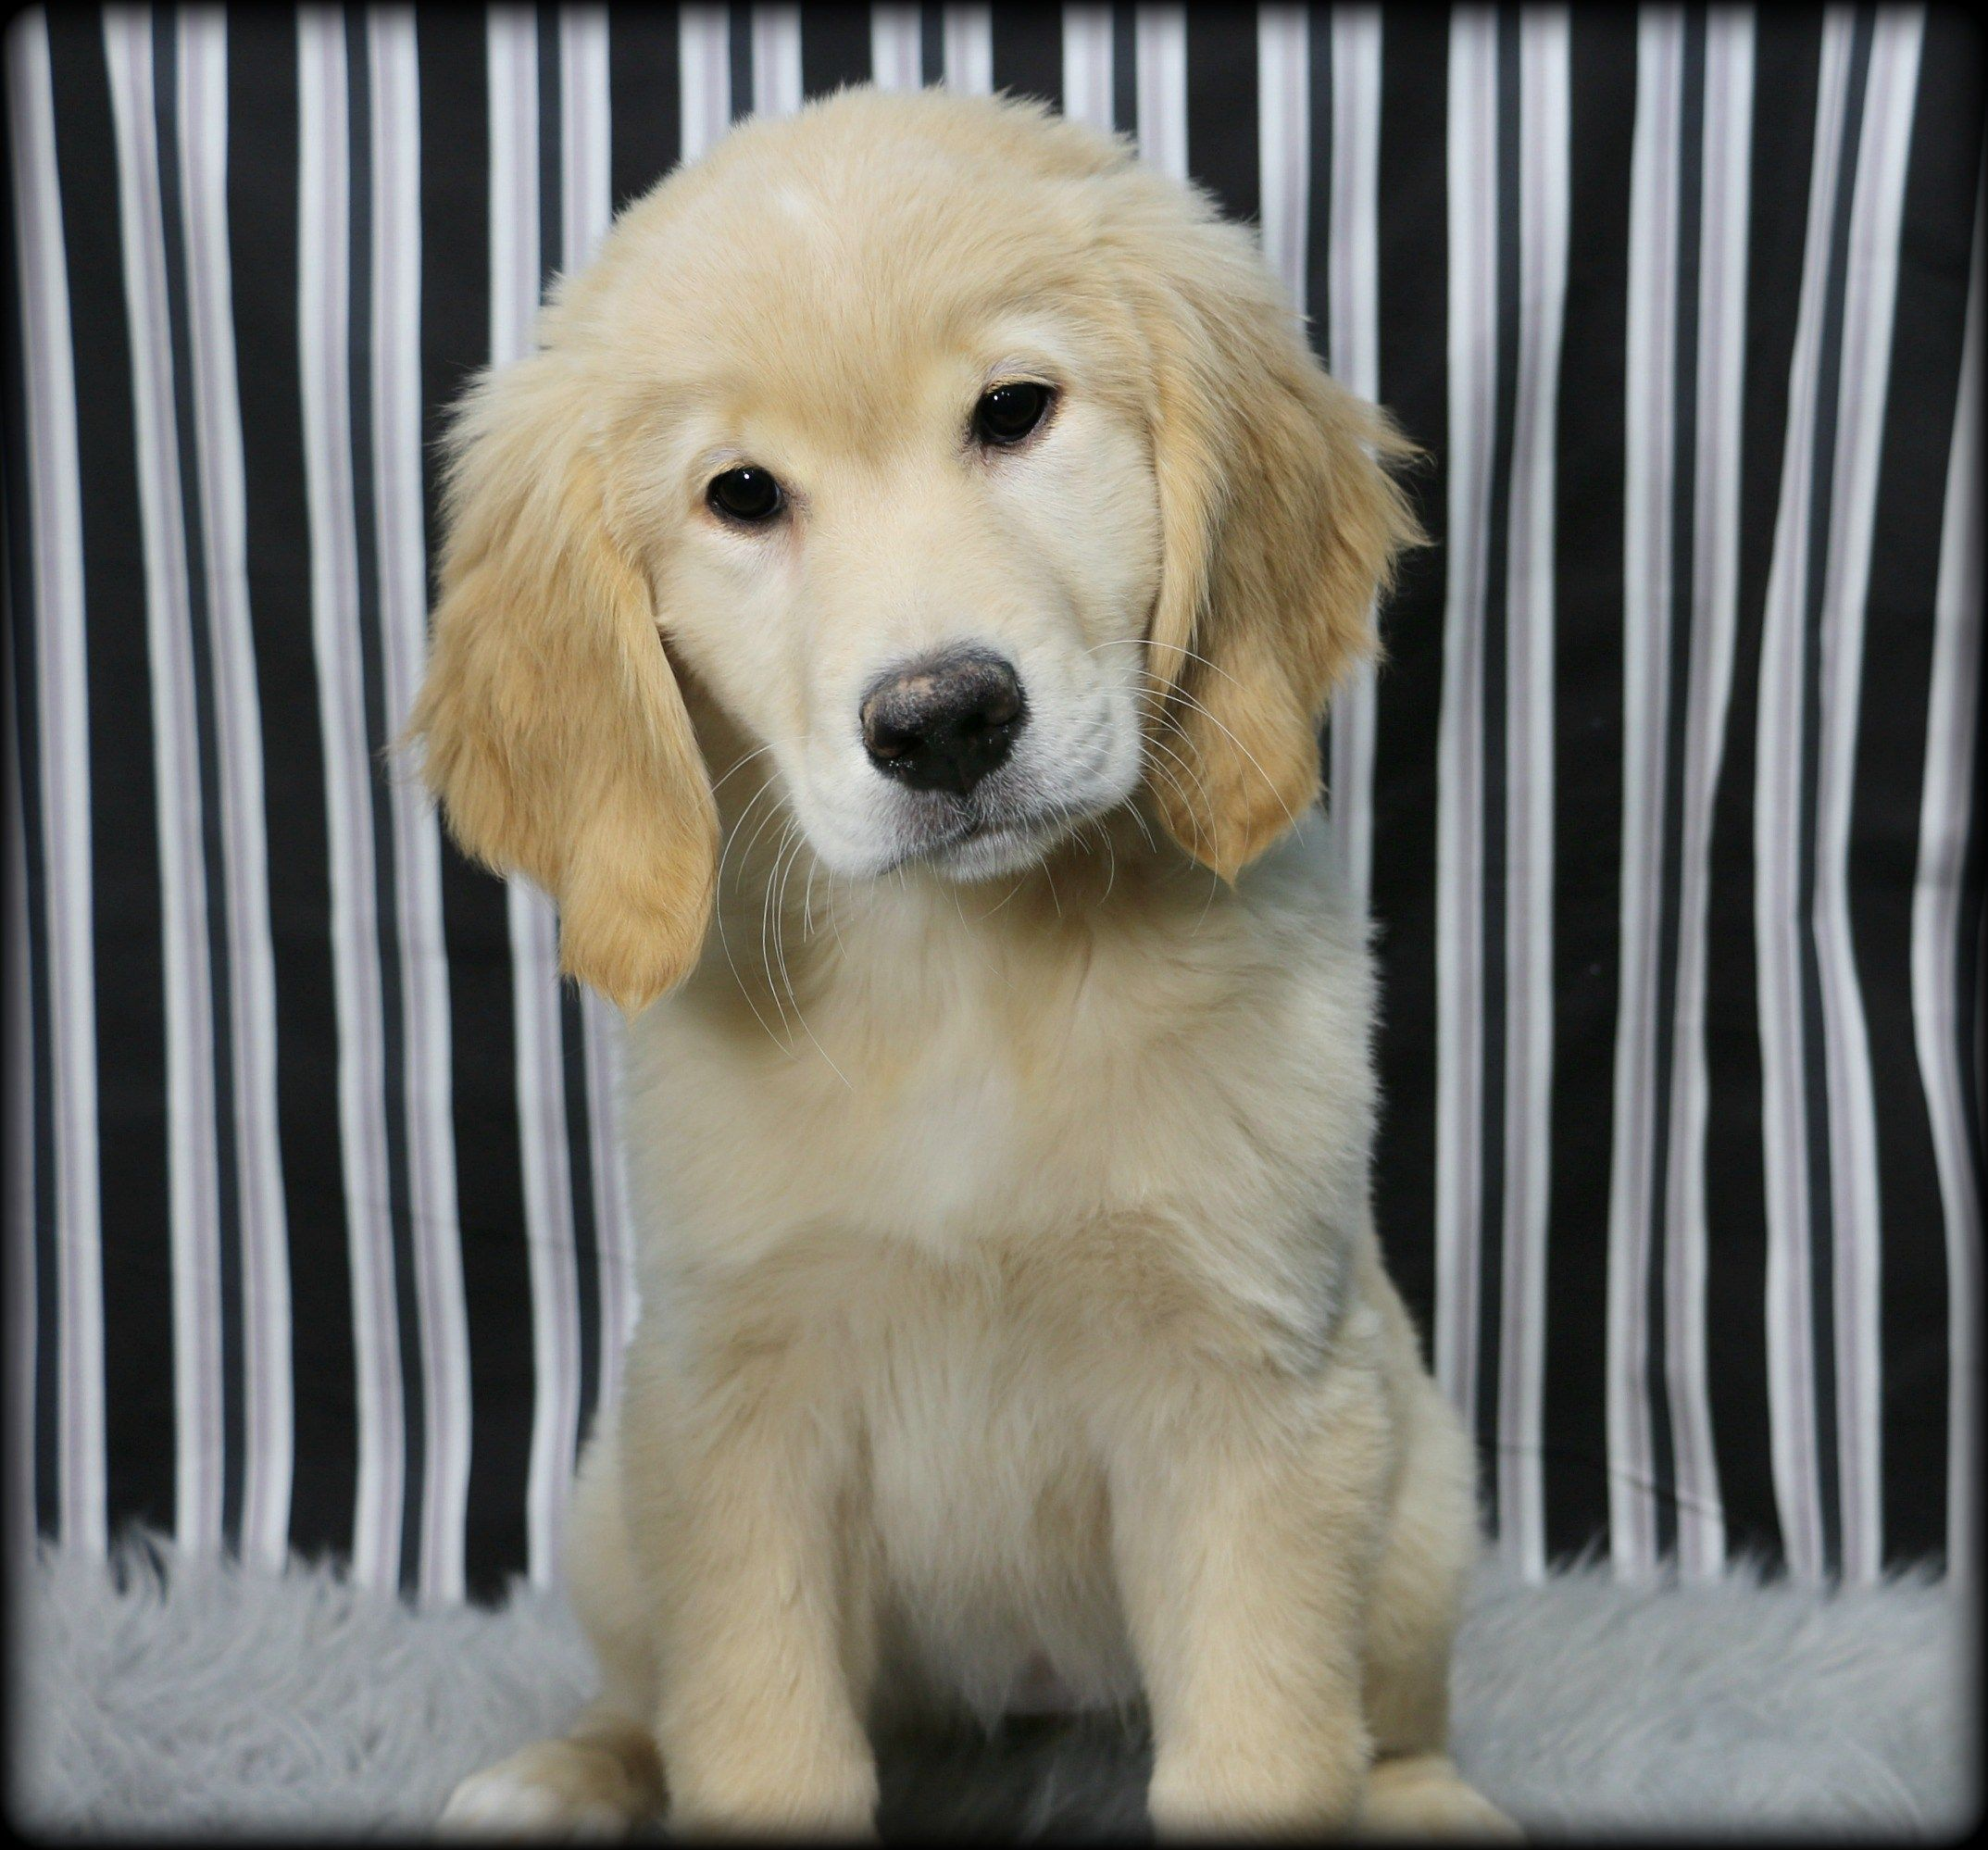 Petland Overland Park Has Golden Retriever Puppies For Sale Check